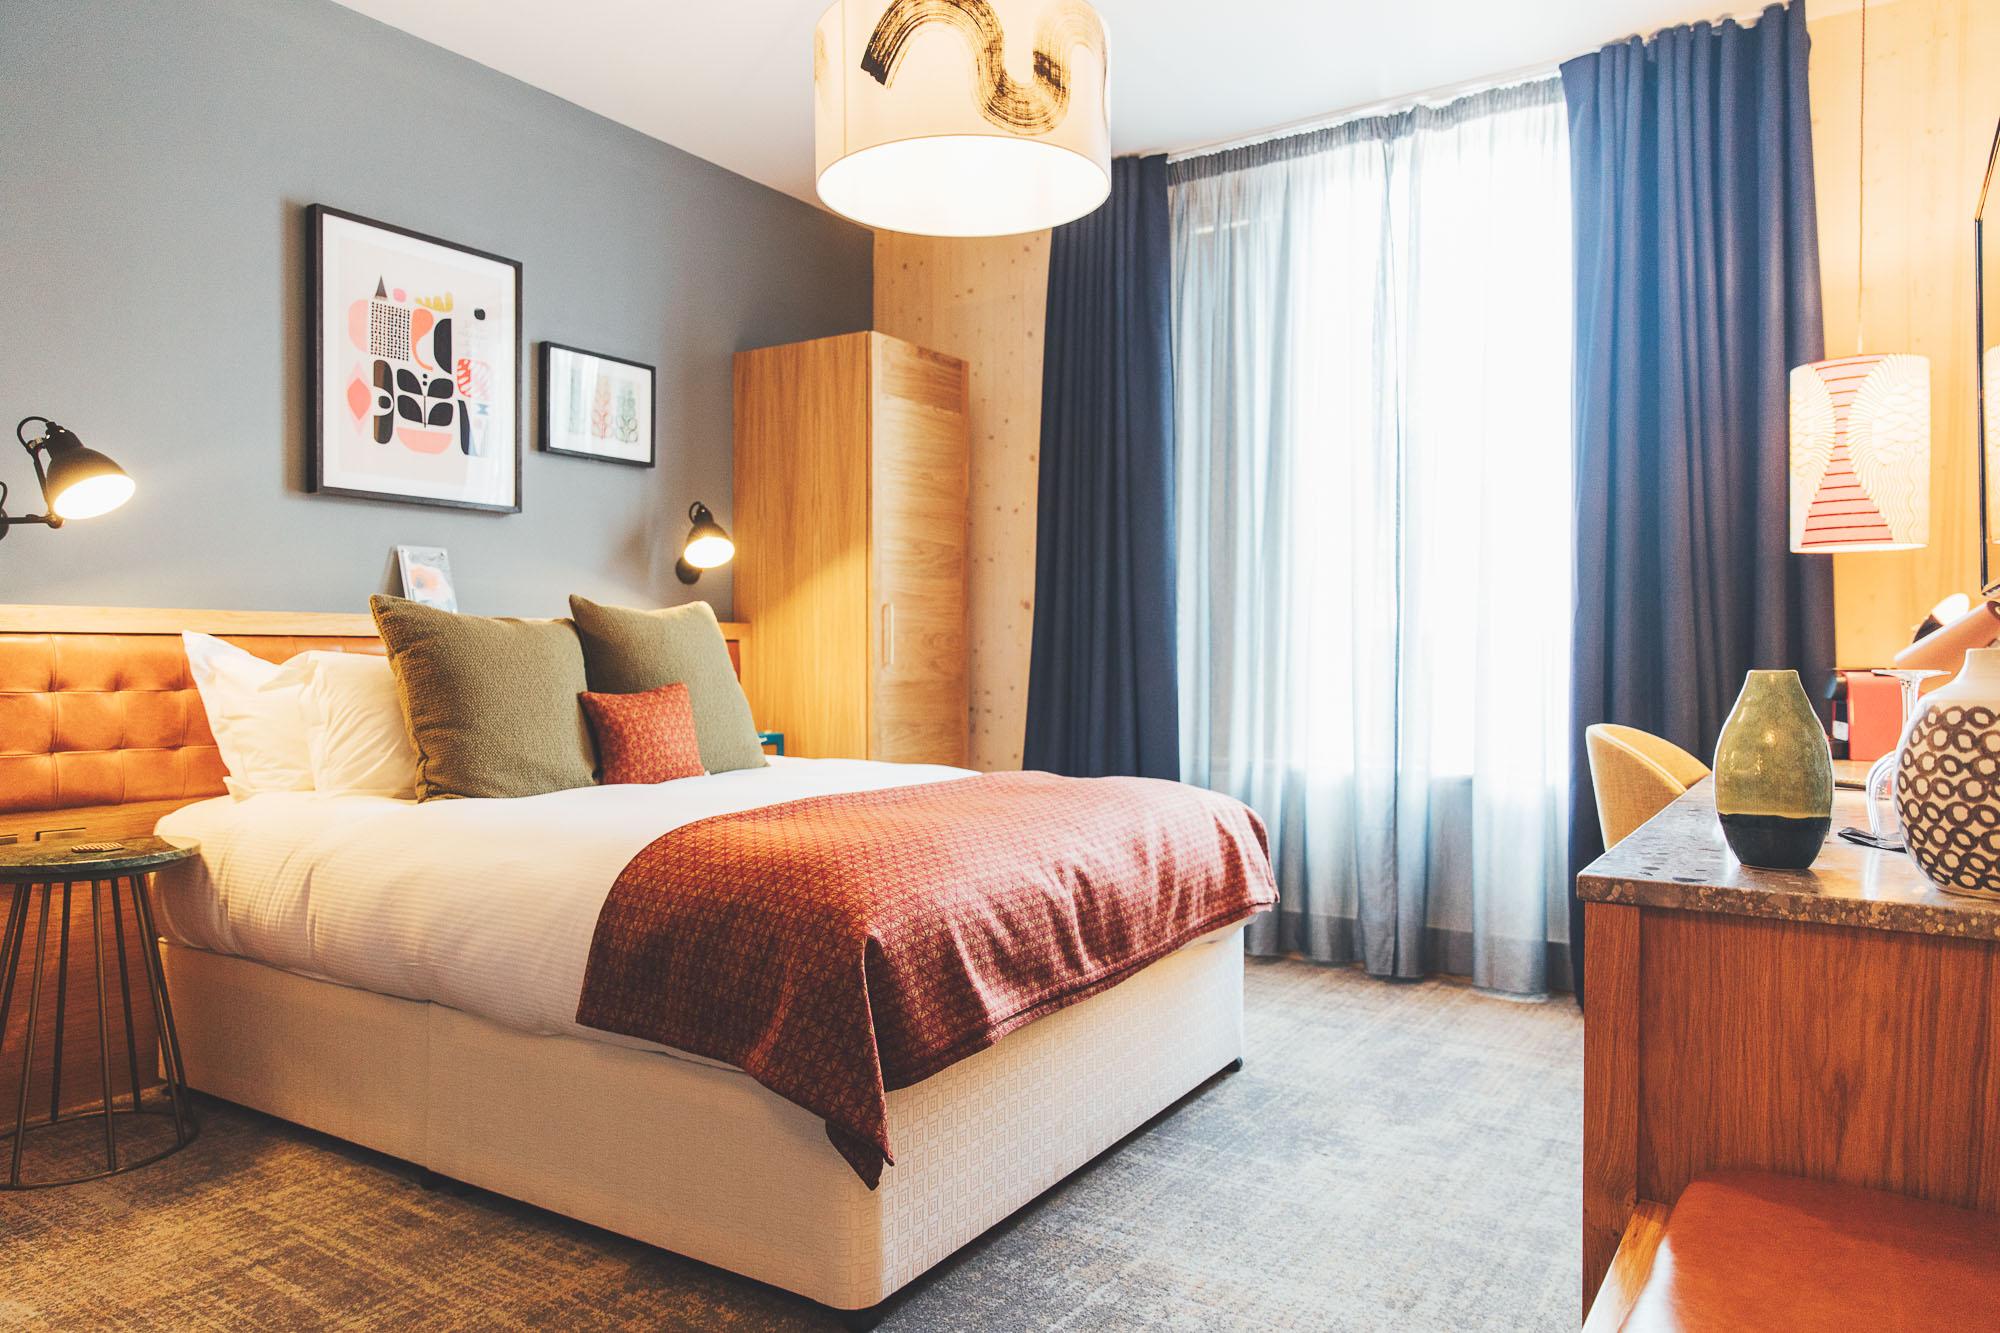 TRF_Hotel_Rooms_Web-00001.jpg